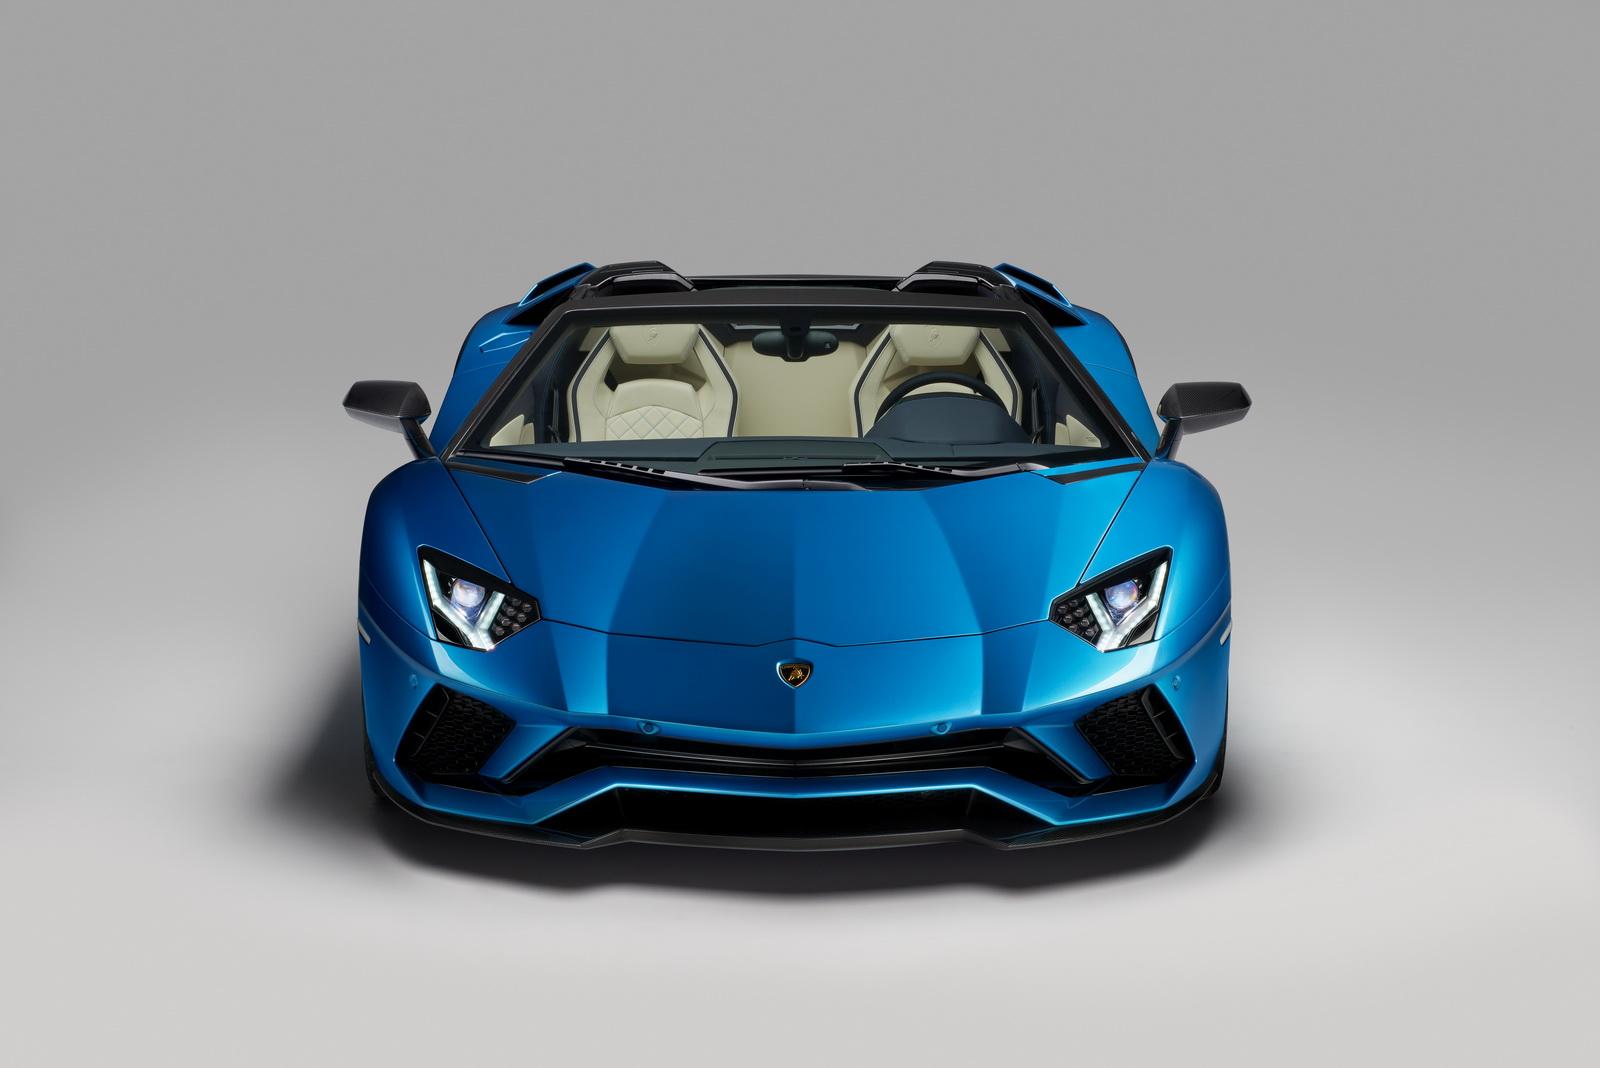 2018_Lamborghini_Aventador_S_Roadster_11